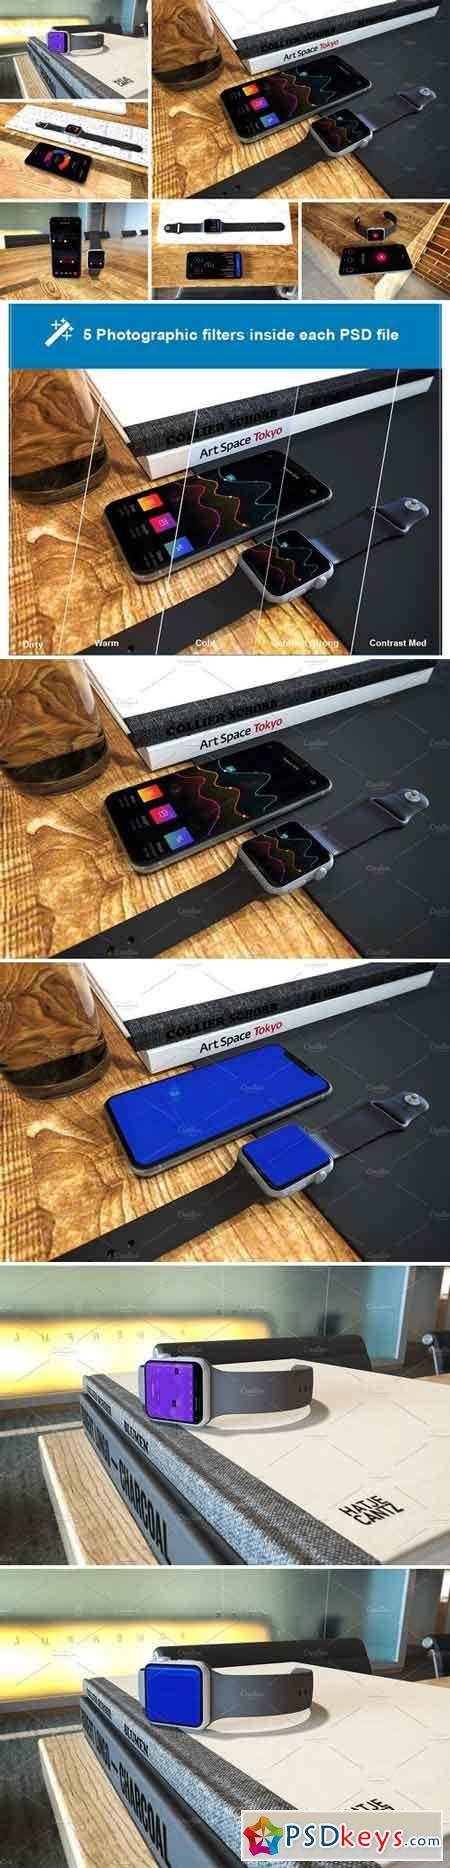 Apple Watch & iPhone Xs 3042418